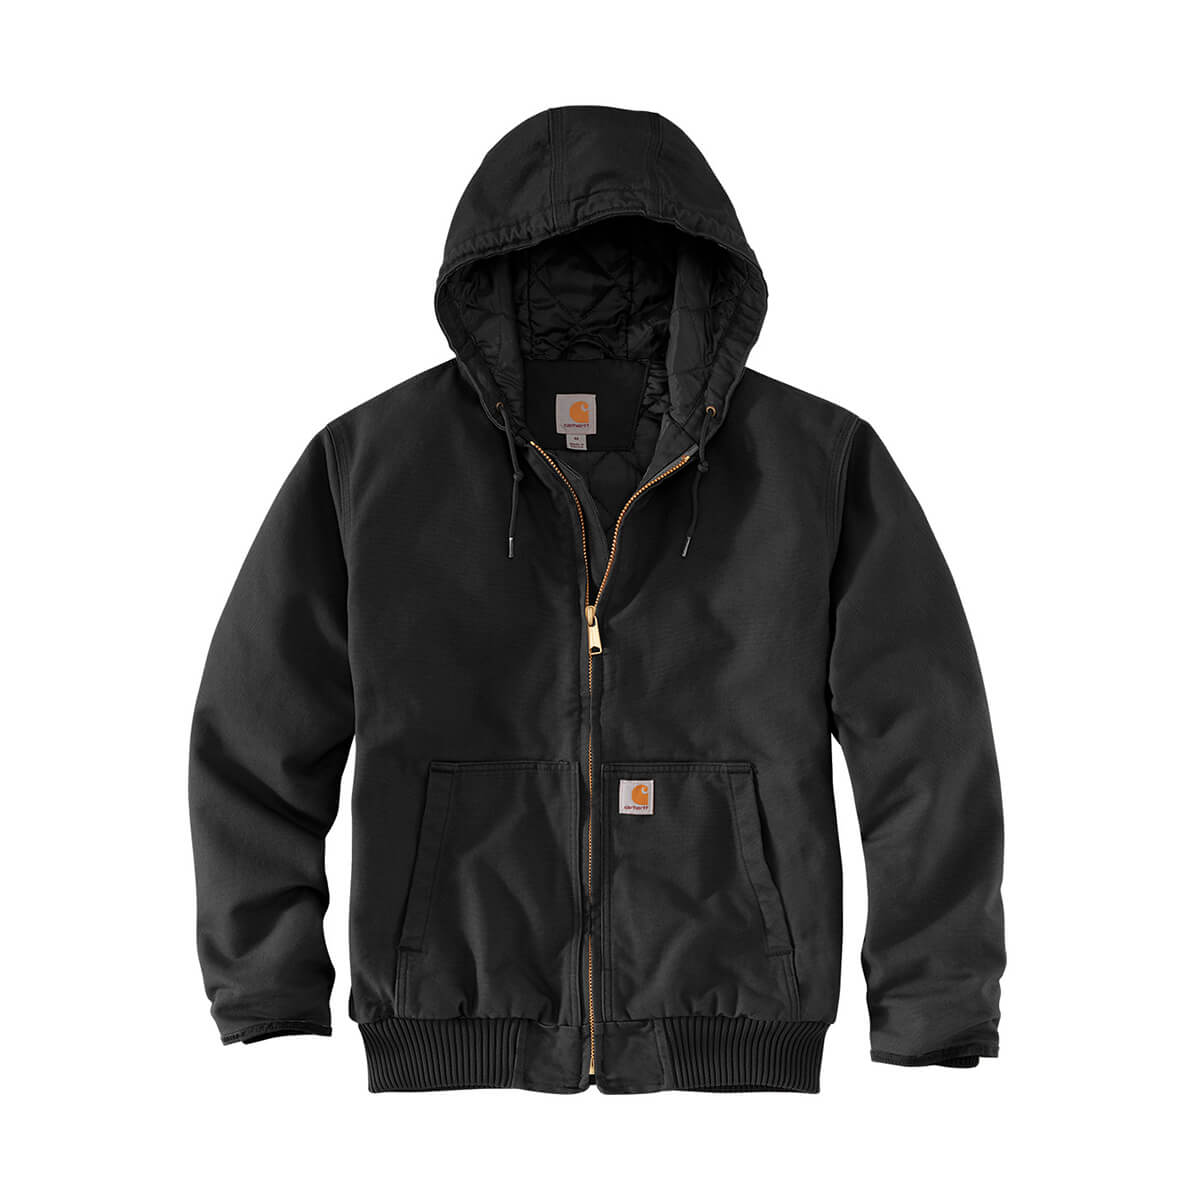 Carhartt Quilted Flannel Lined Sandstone Active Jacket - Black